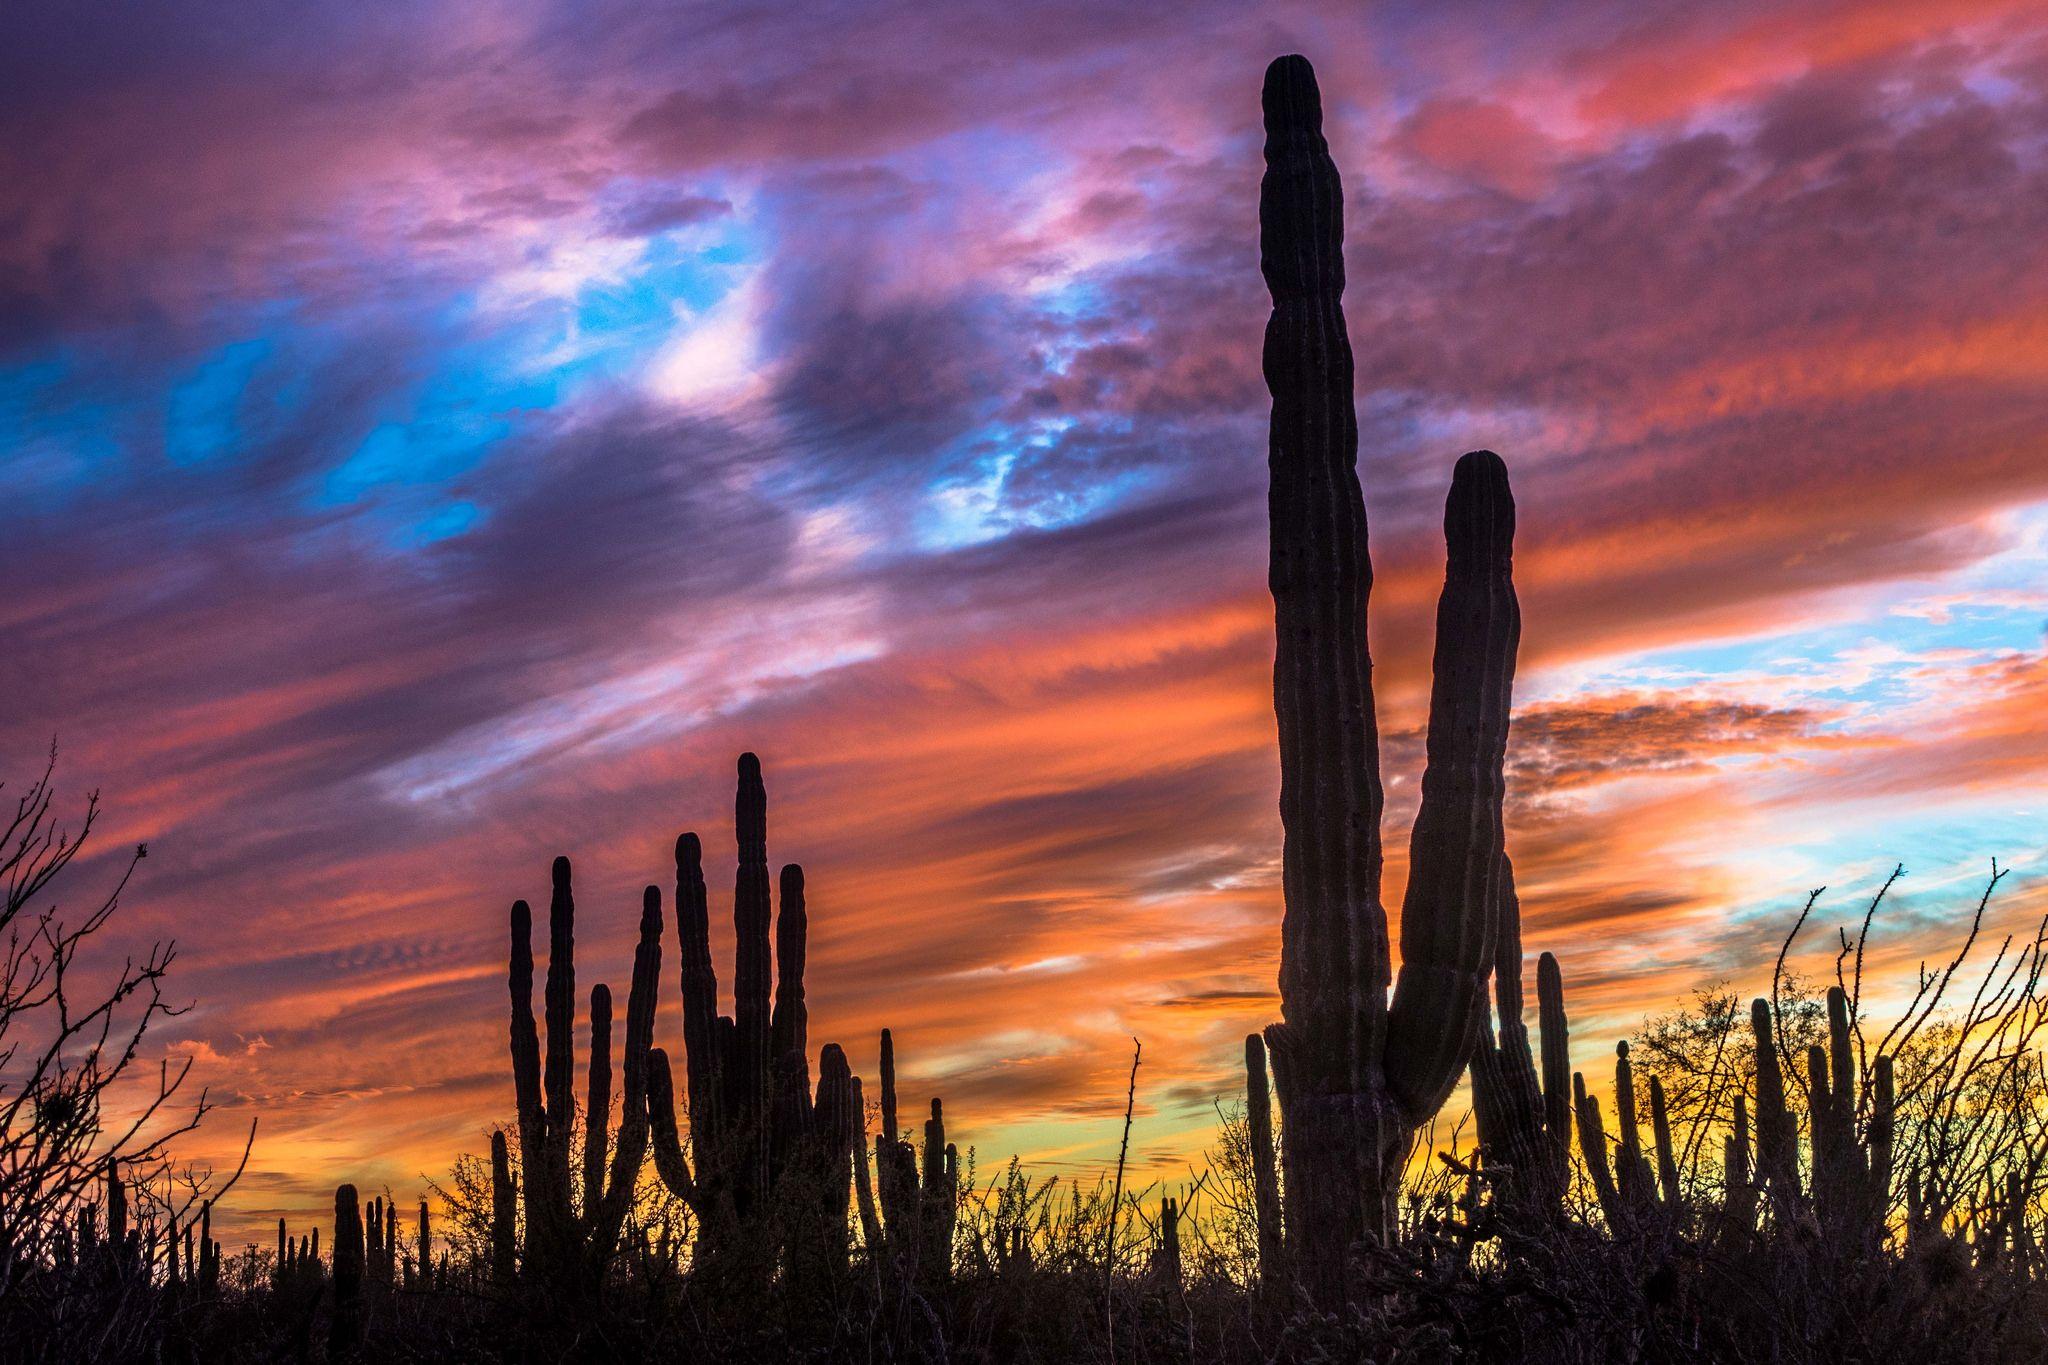 Wild-camping in the desert near Ciudad Insurgente, Baja ...